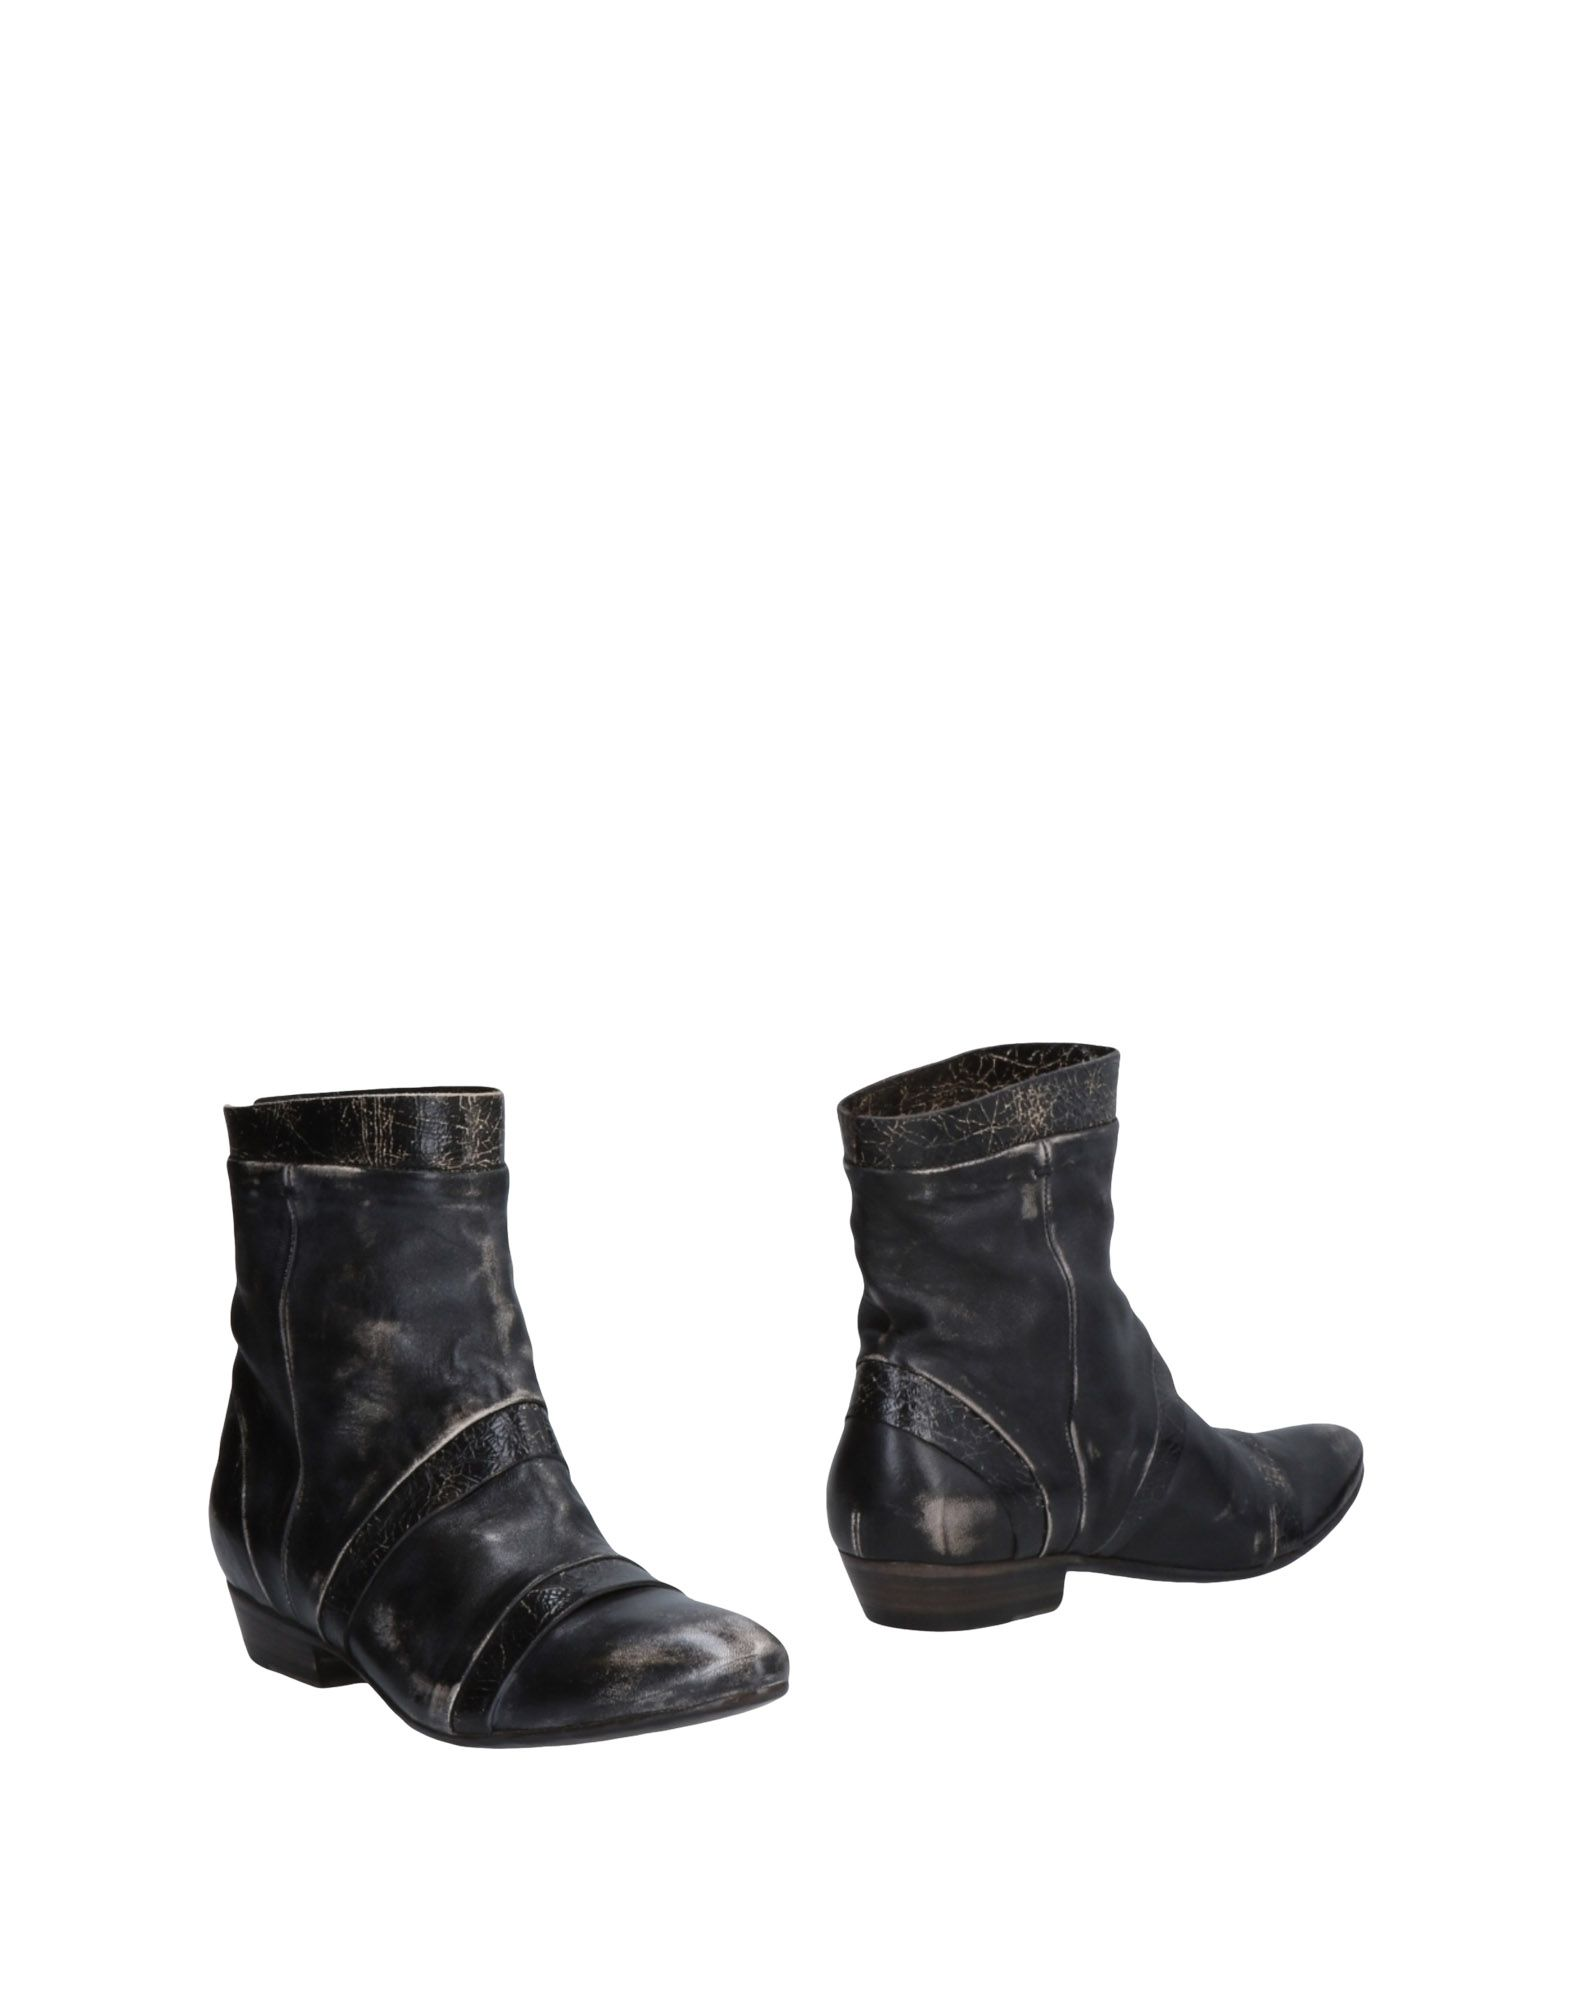 Pantanetti Stiefelette Damen  Heiße 11468077JV Heiße  Schuhe 904259